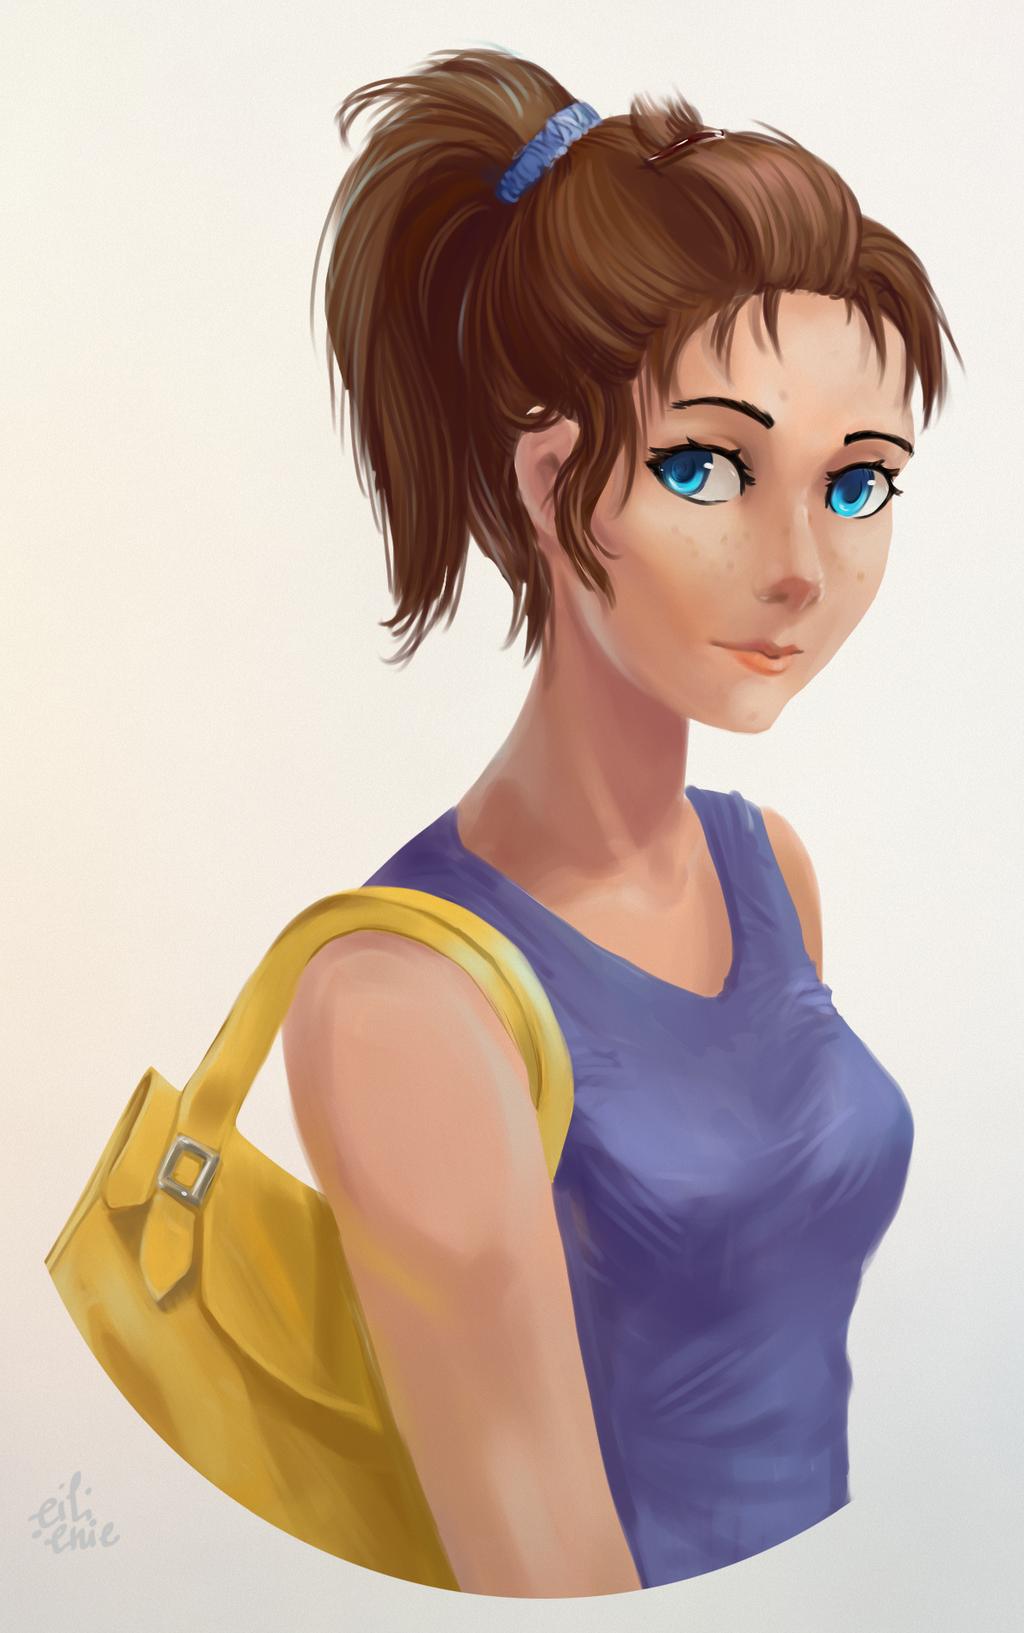 EiliEnie's Profile Picture